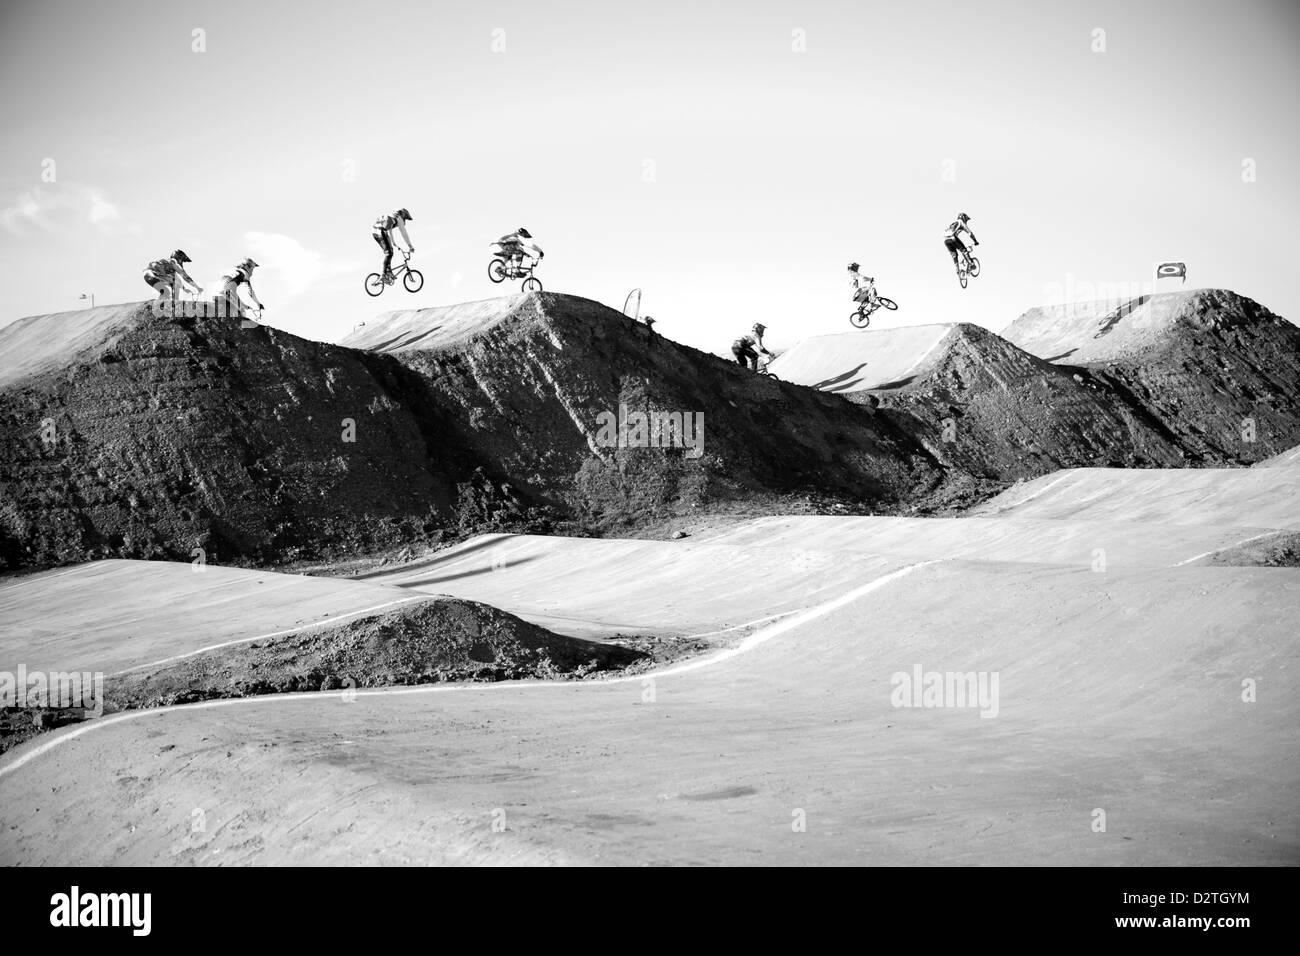 bmx track race at olypics park london - Stock Image